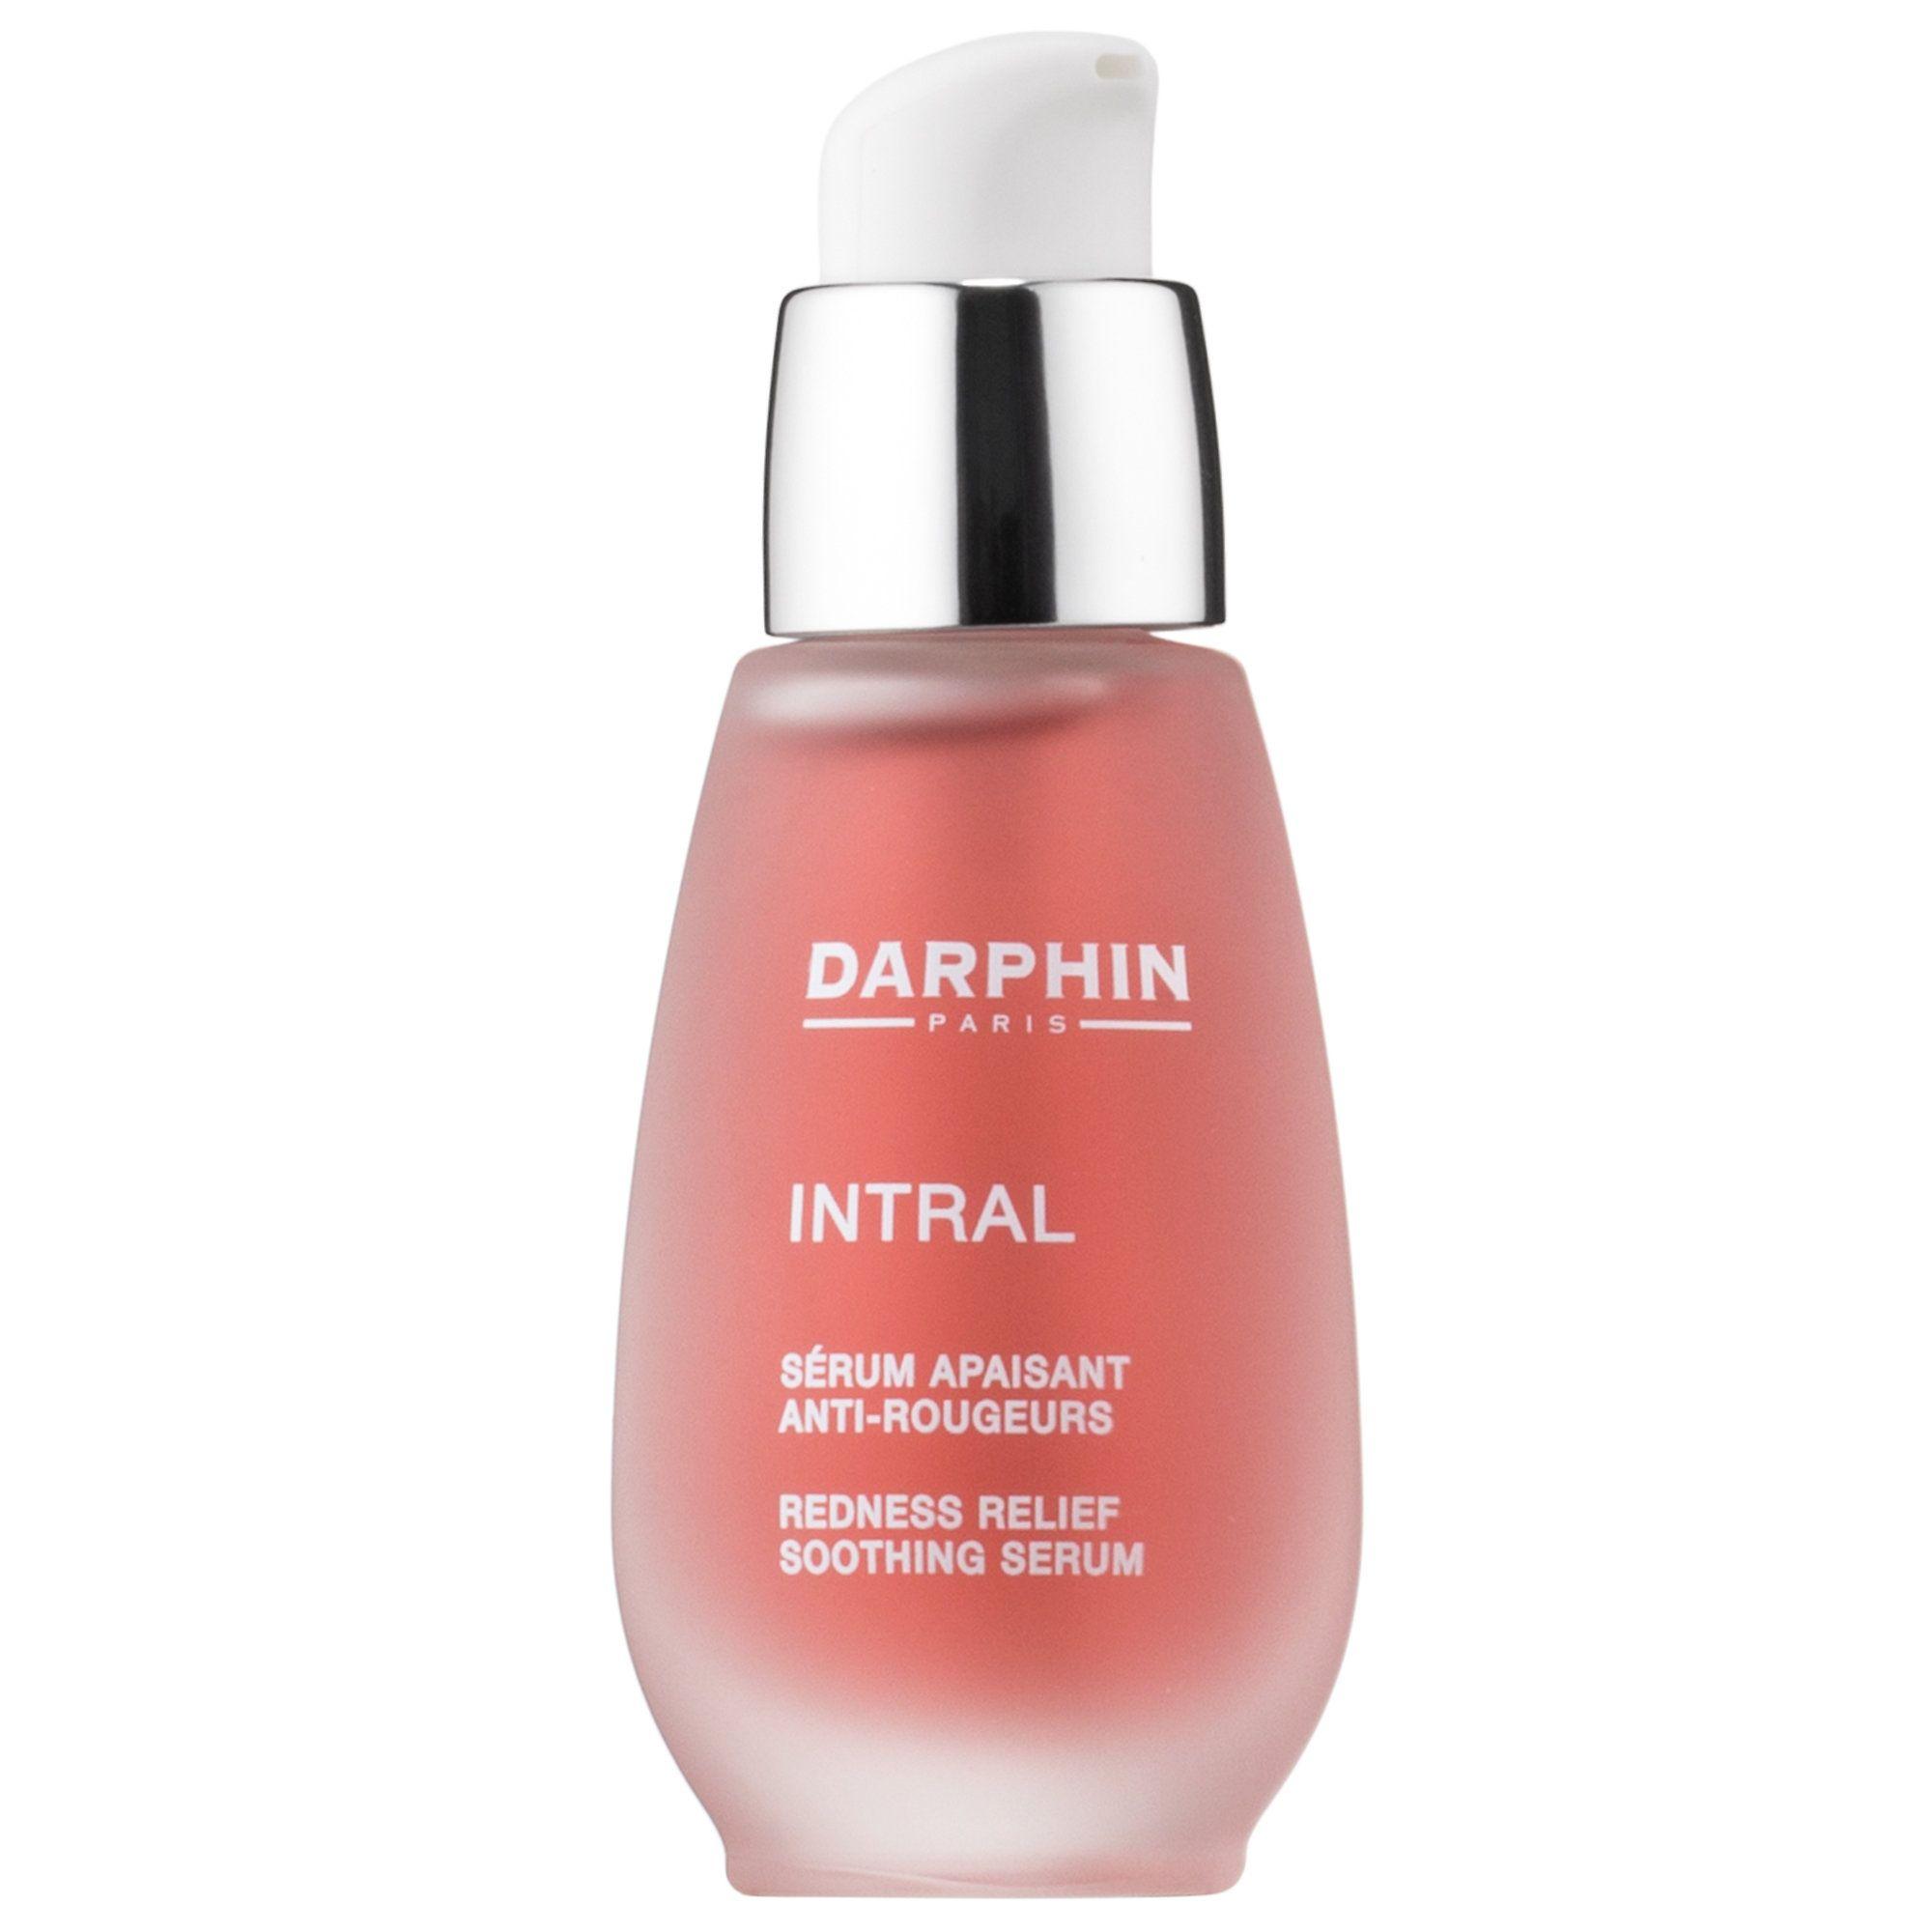 Cosmetics, Beauty Products, Fragrances & Tools Sephora